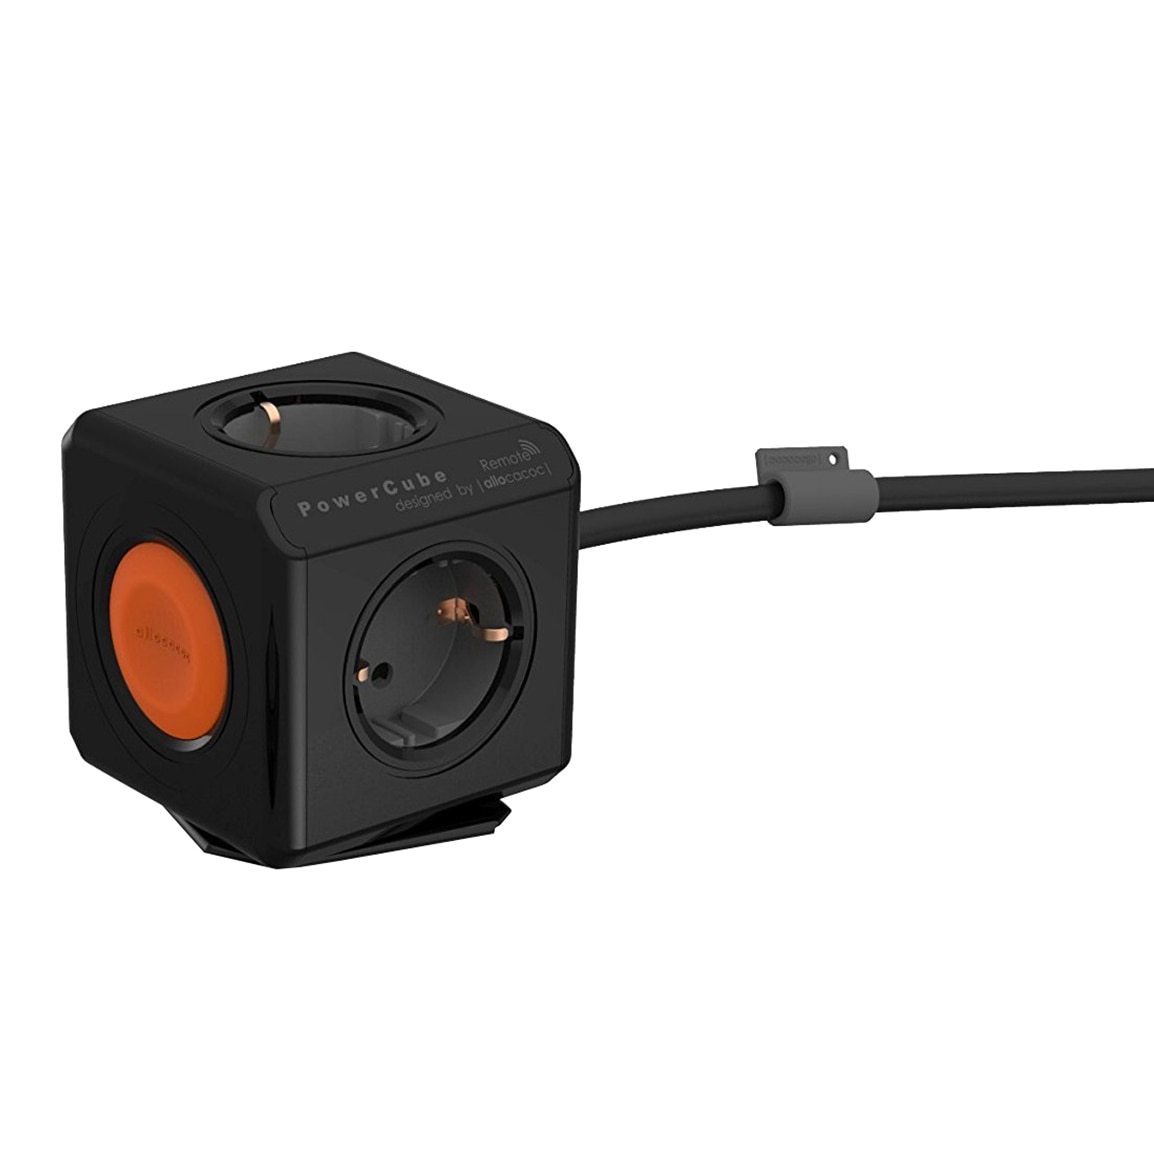 Fotografie Priza PowerCube Allocacoc Extended, cablu 1.5 m, Negru